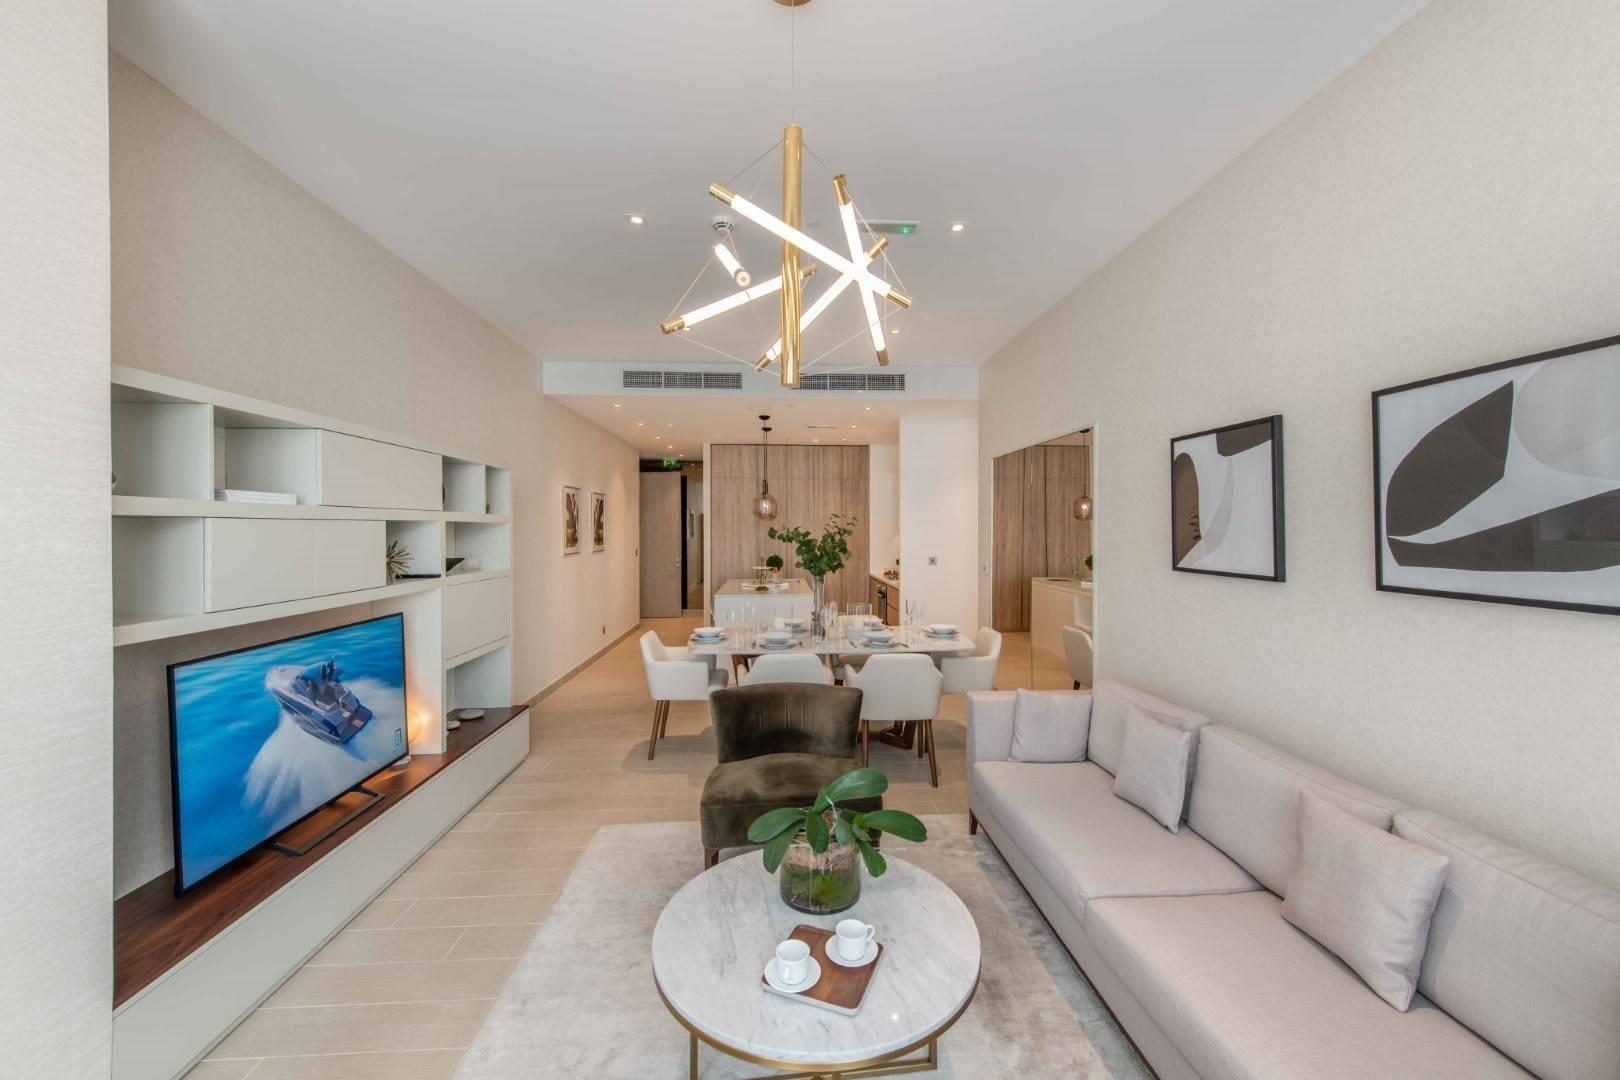 Luxury Finish I Lovely 1 Bedroom Apartment